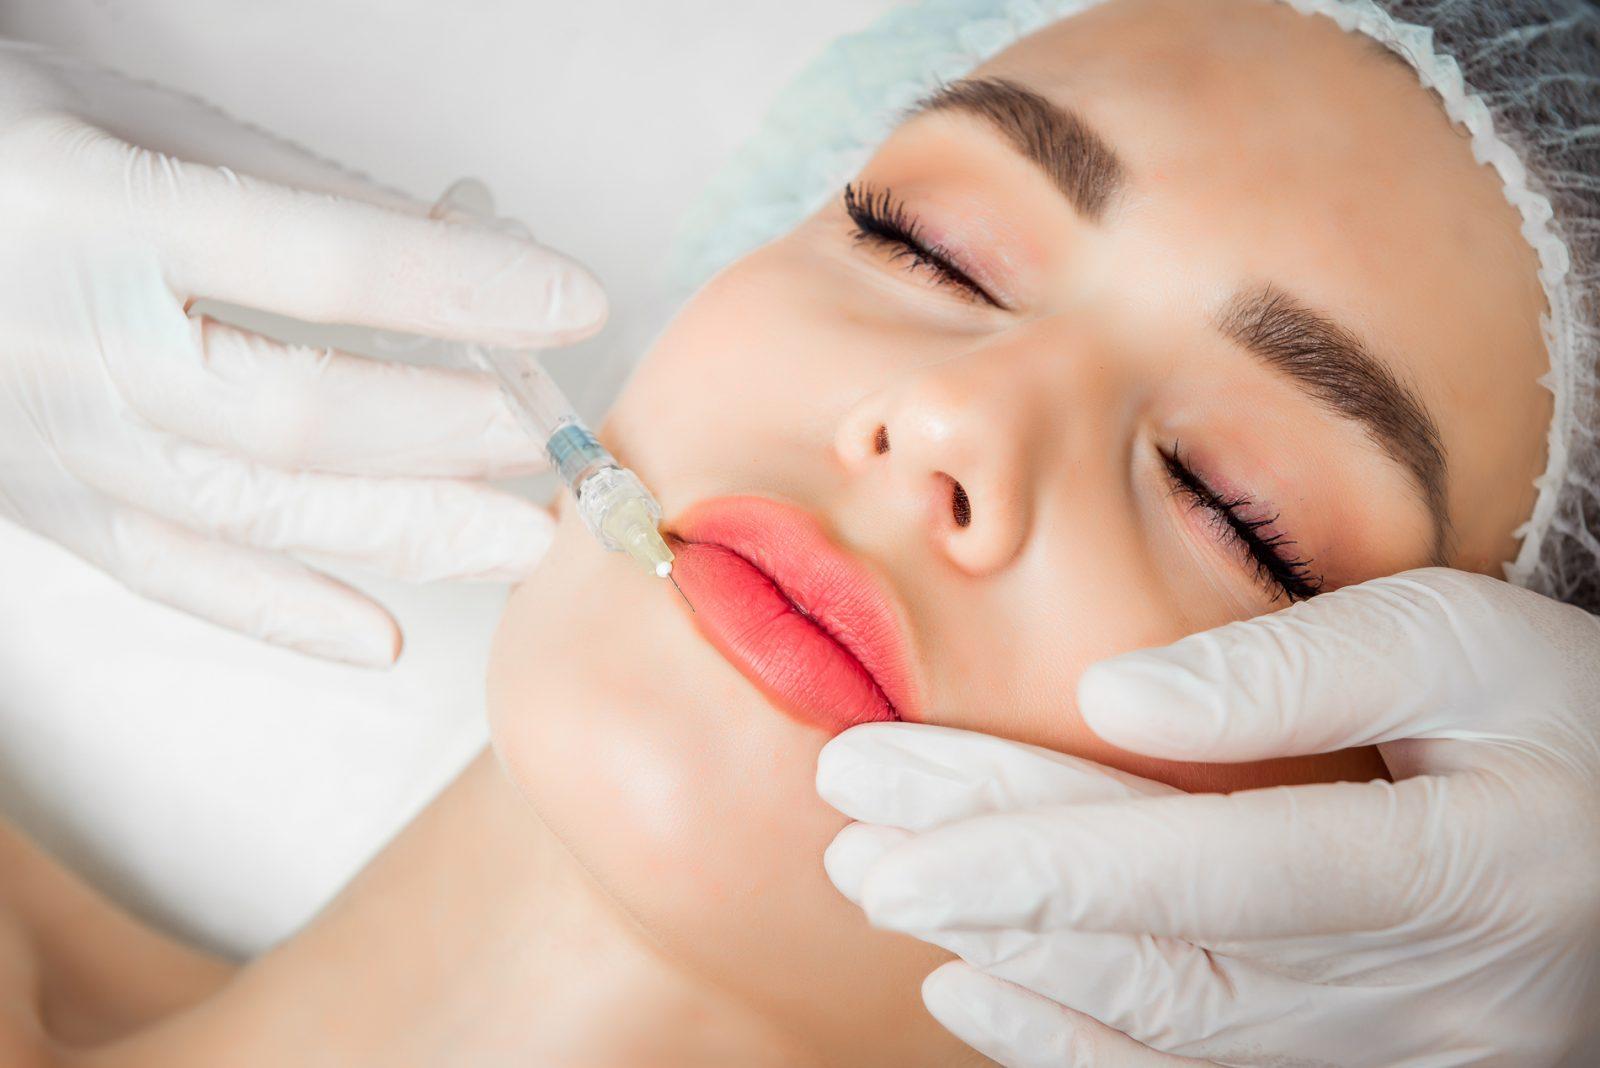 clinica, bodycience, Preenchimento de lábios